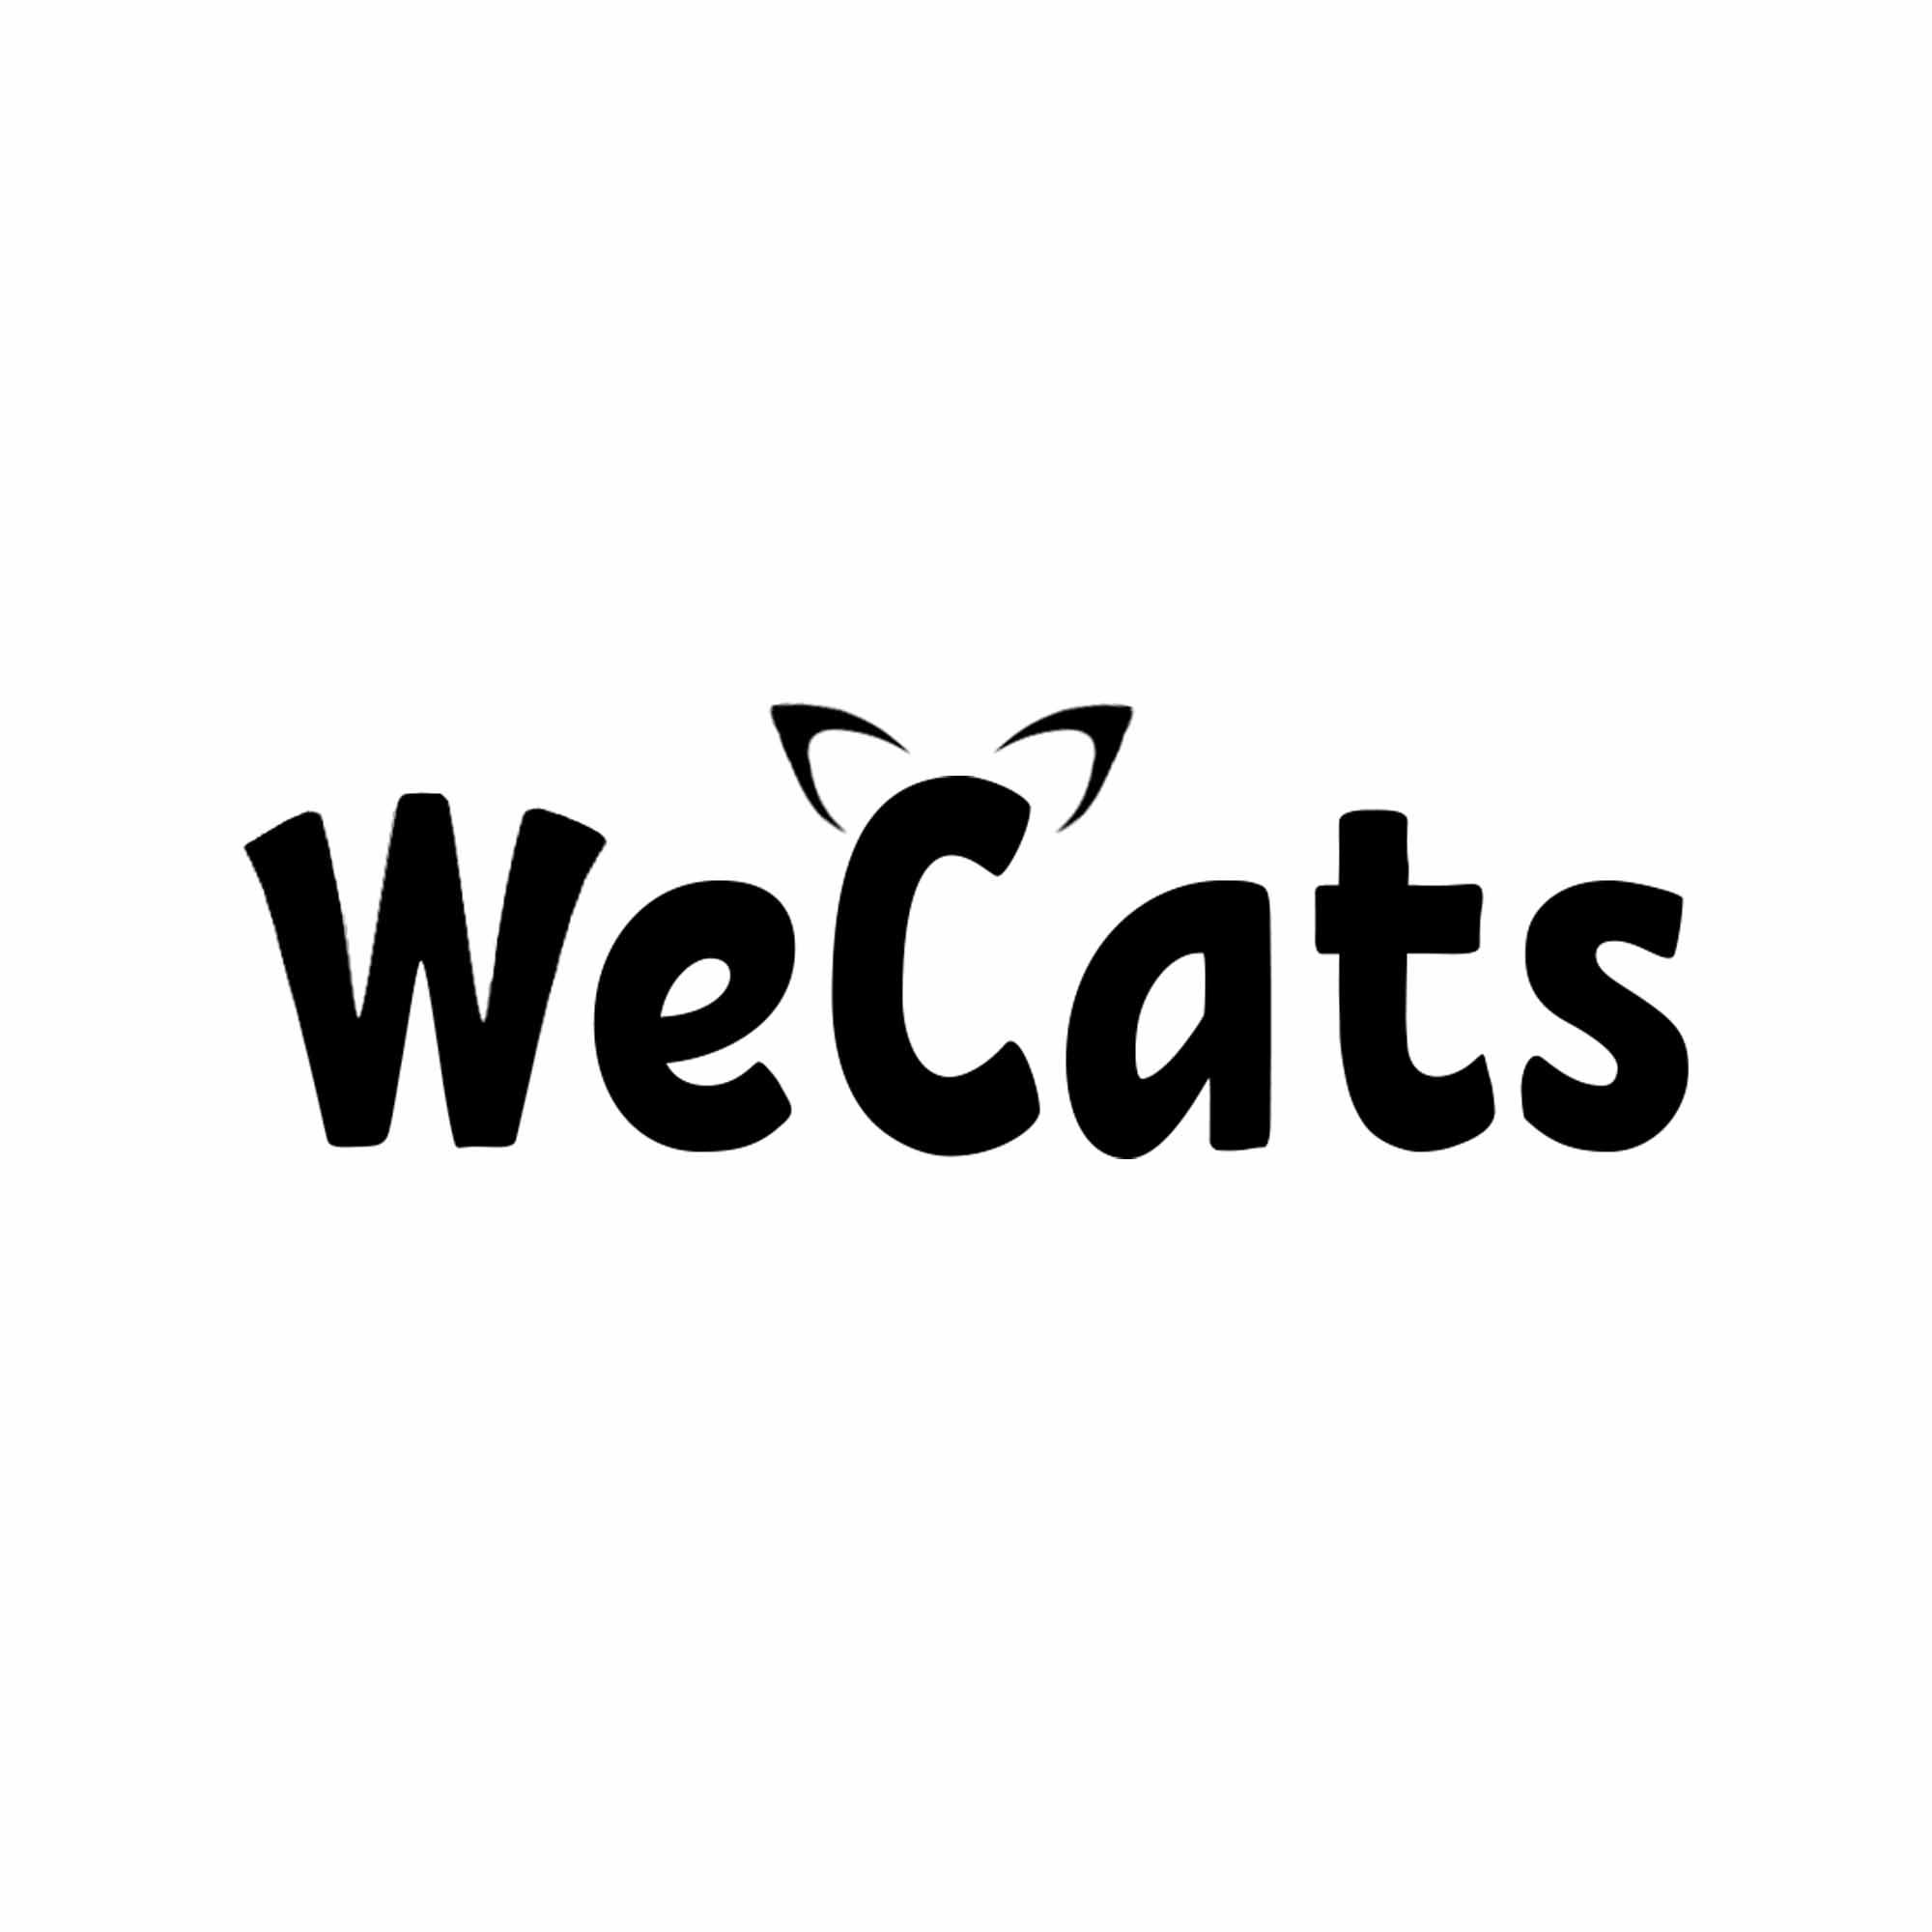 Создание логотипа WeCats фото f_9195f18390f8cf2d.jpg